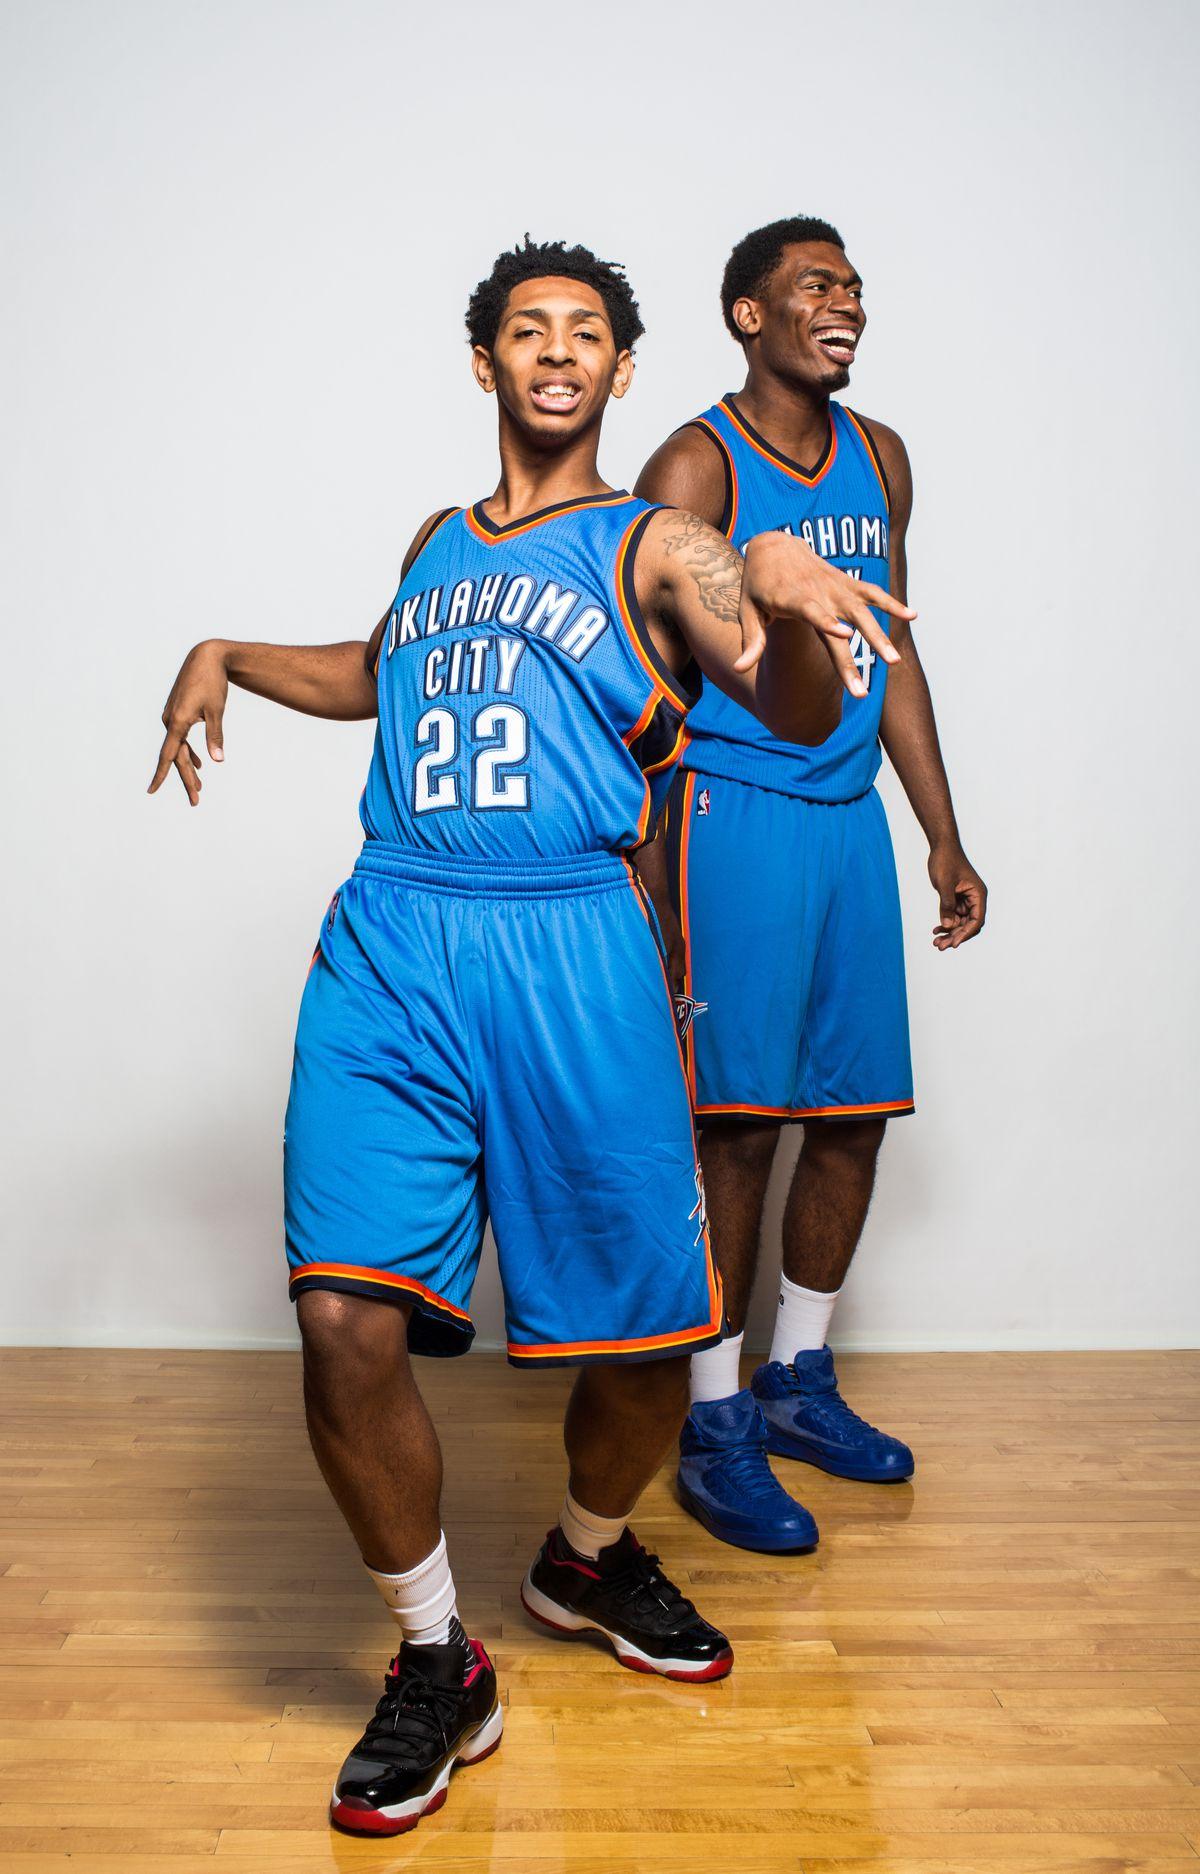 Cameron Payne #22 and Dakari Johnson #33 of the Thunder pose during 2015 NBA rookie photo shoot. (Getty Images)